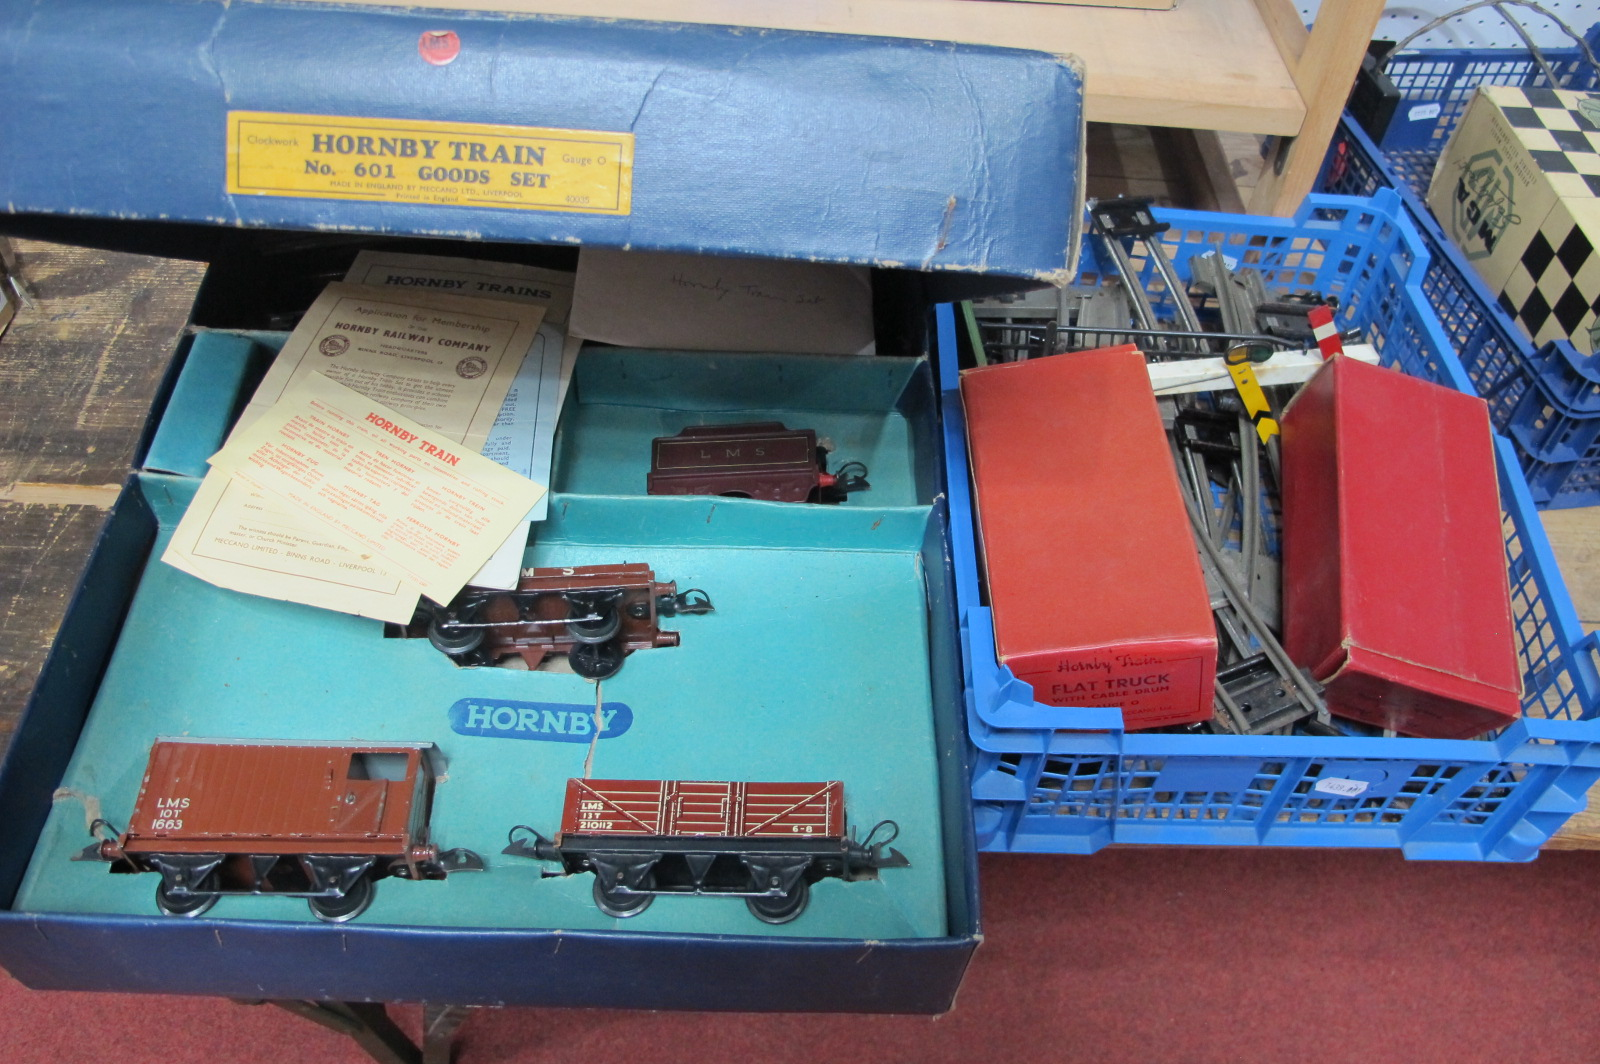 A 1960 Hornby 'O' Gauge Clockwork Set No 601, comprising 0-4-0 LMS locomotive and tender and three